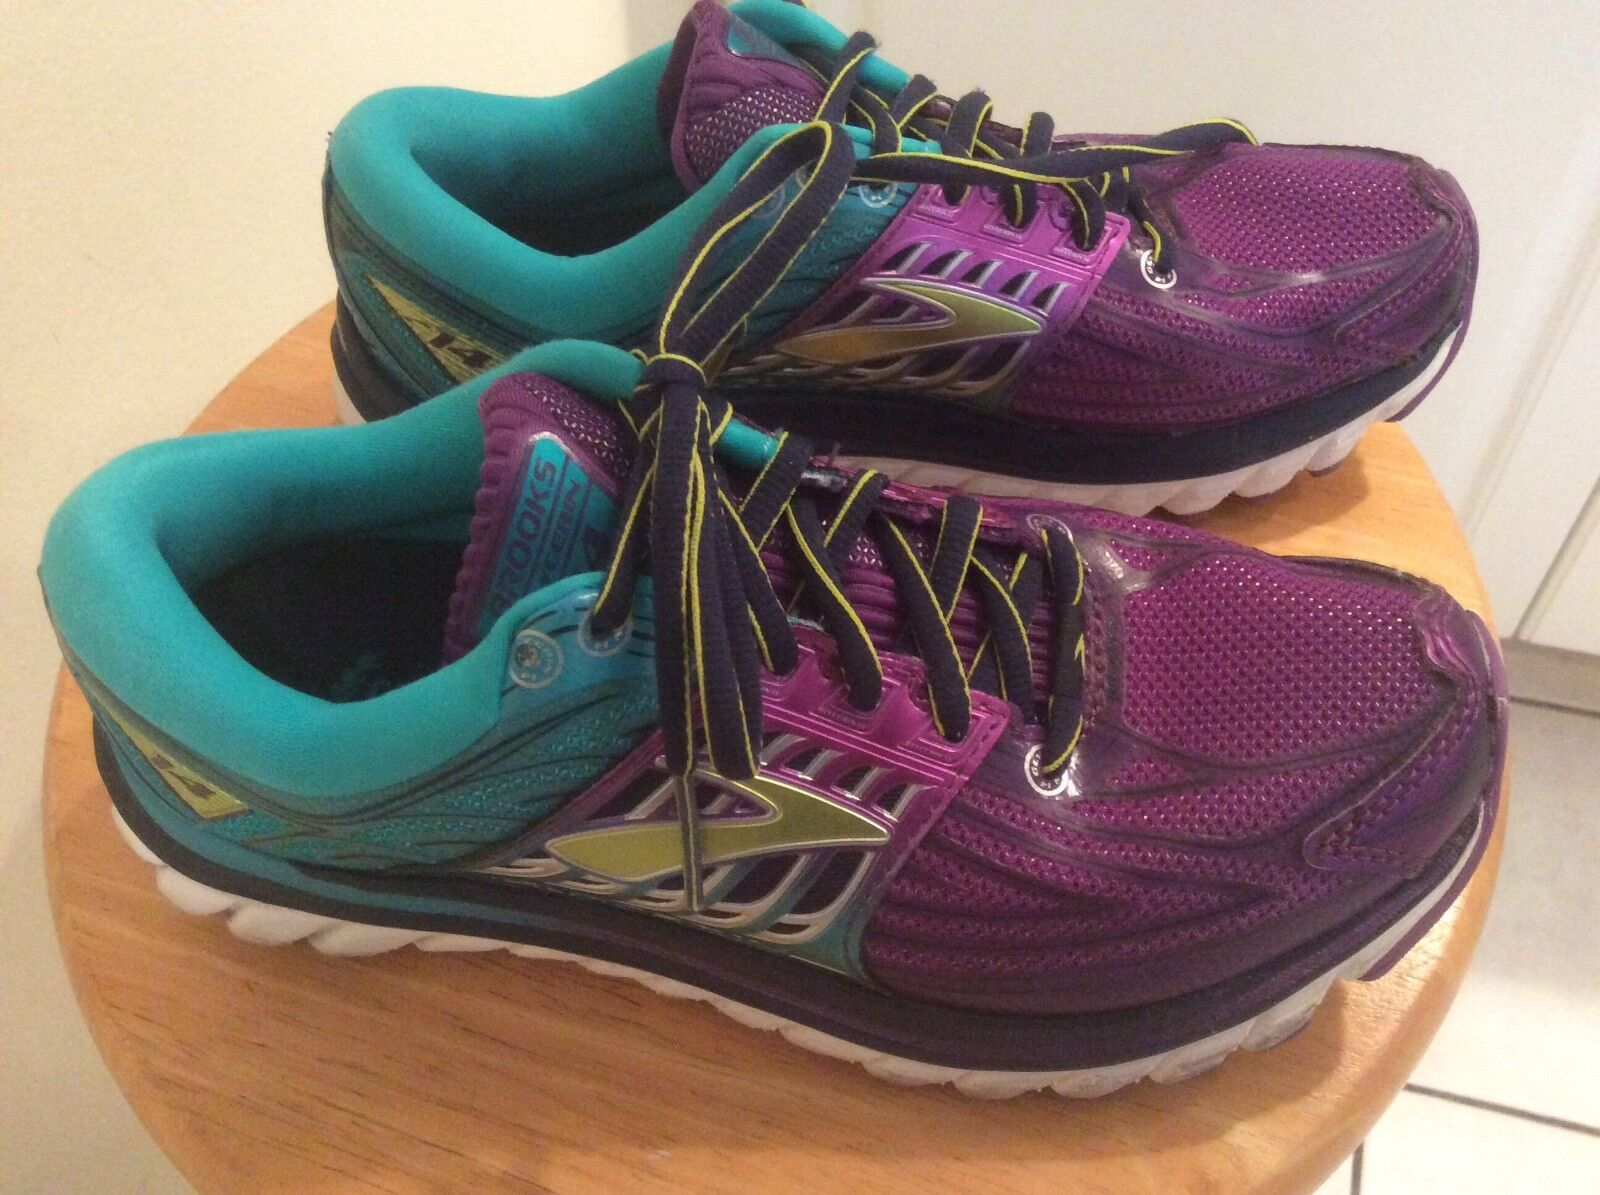 89a21611ef2f3 Brooks Glycerin 14 Pansy Ceramic Ceramic Ceramic Purple Lime Women Running  Shoes 120217 1B 6.5 3f0504